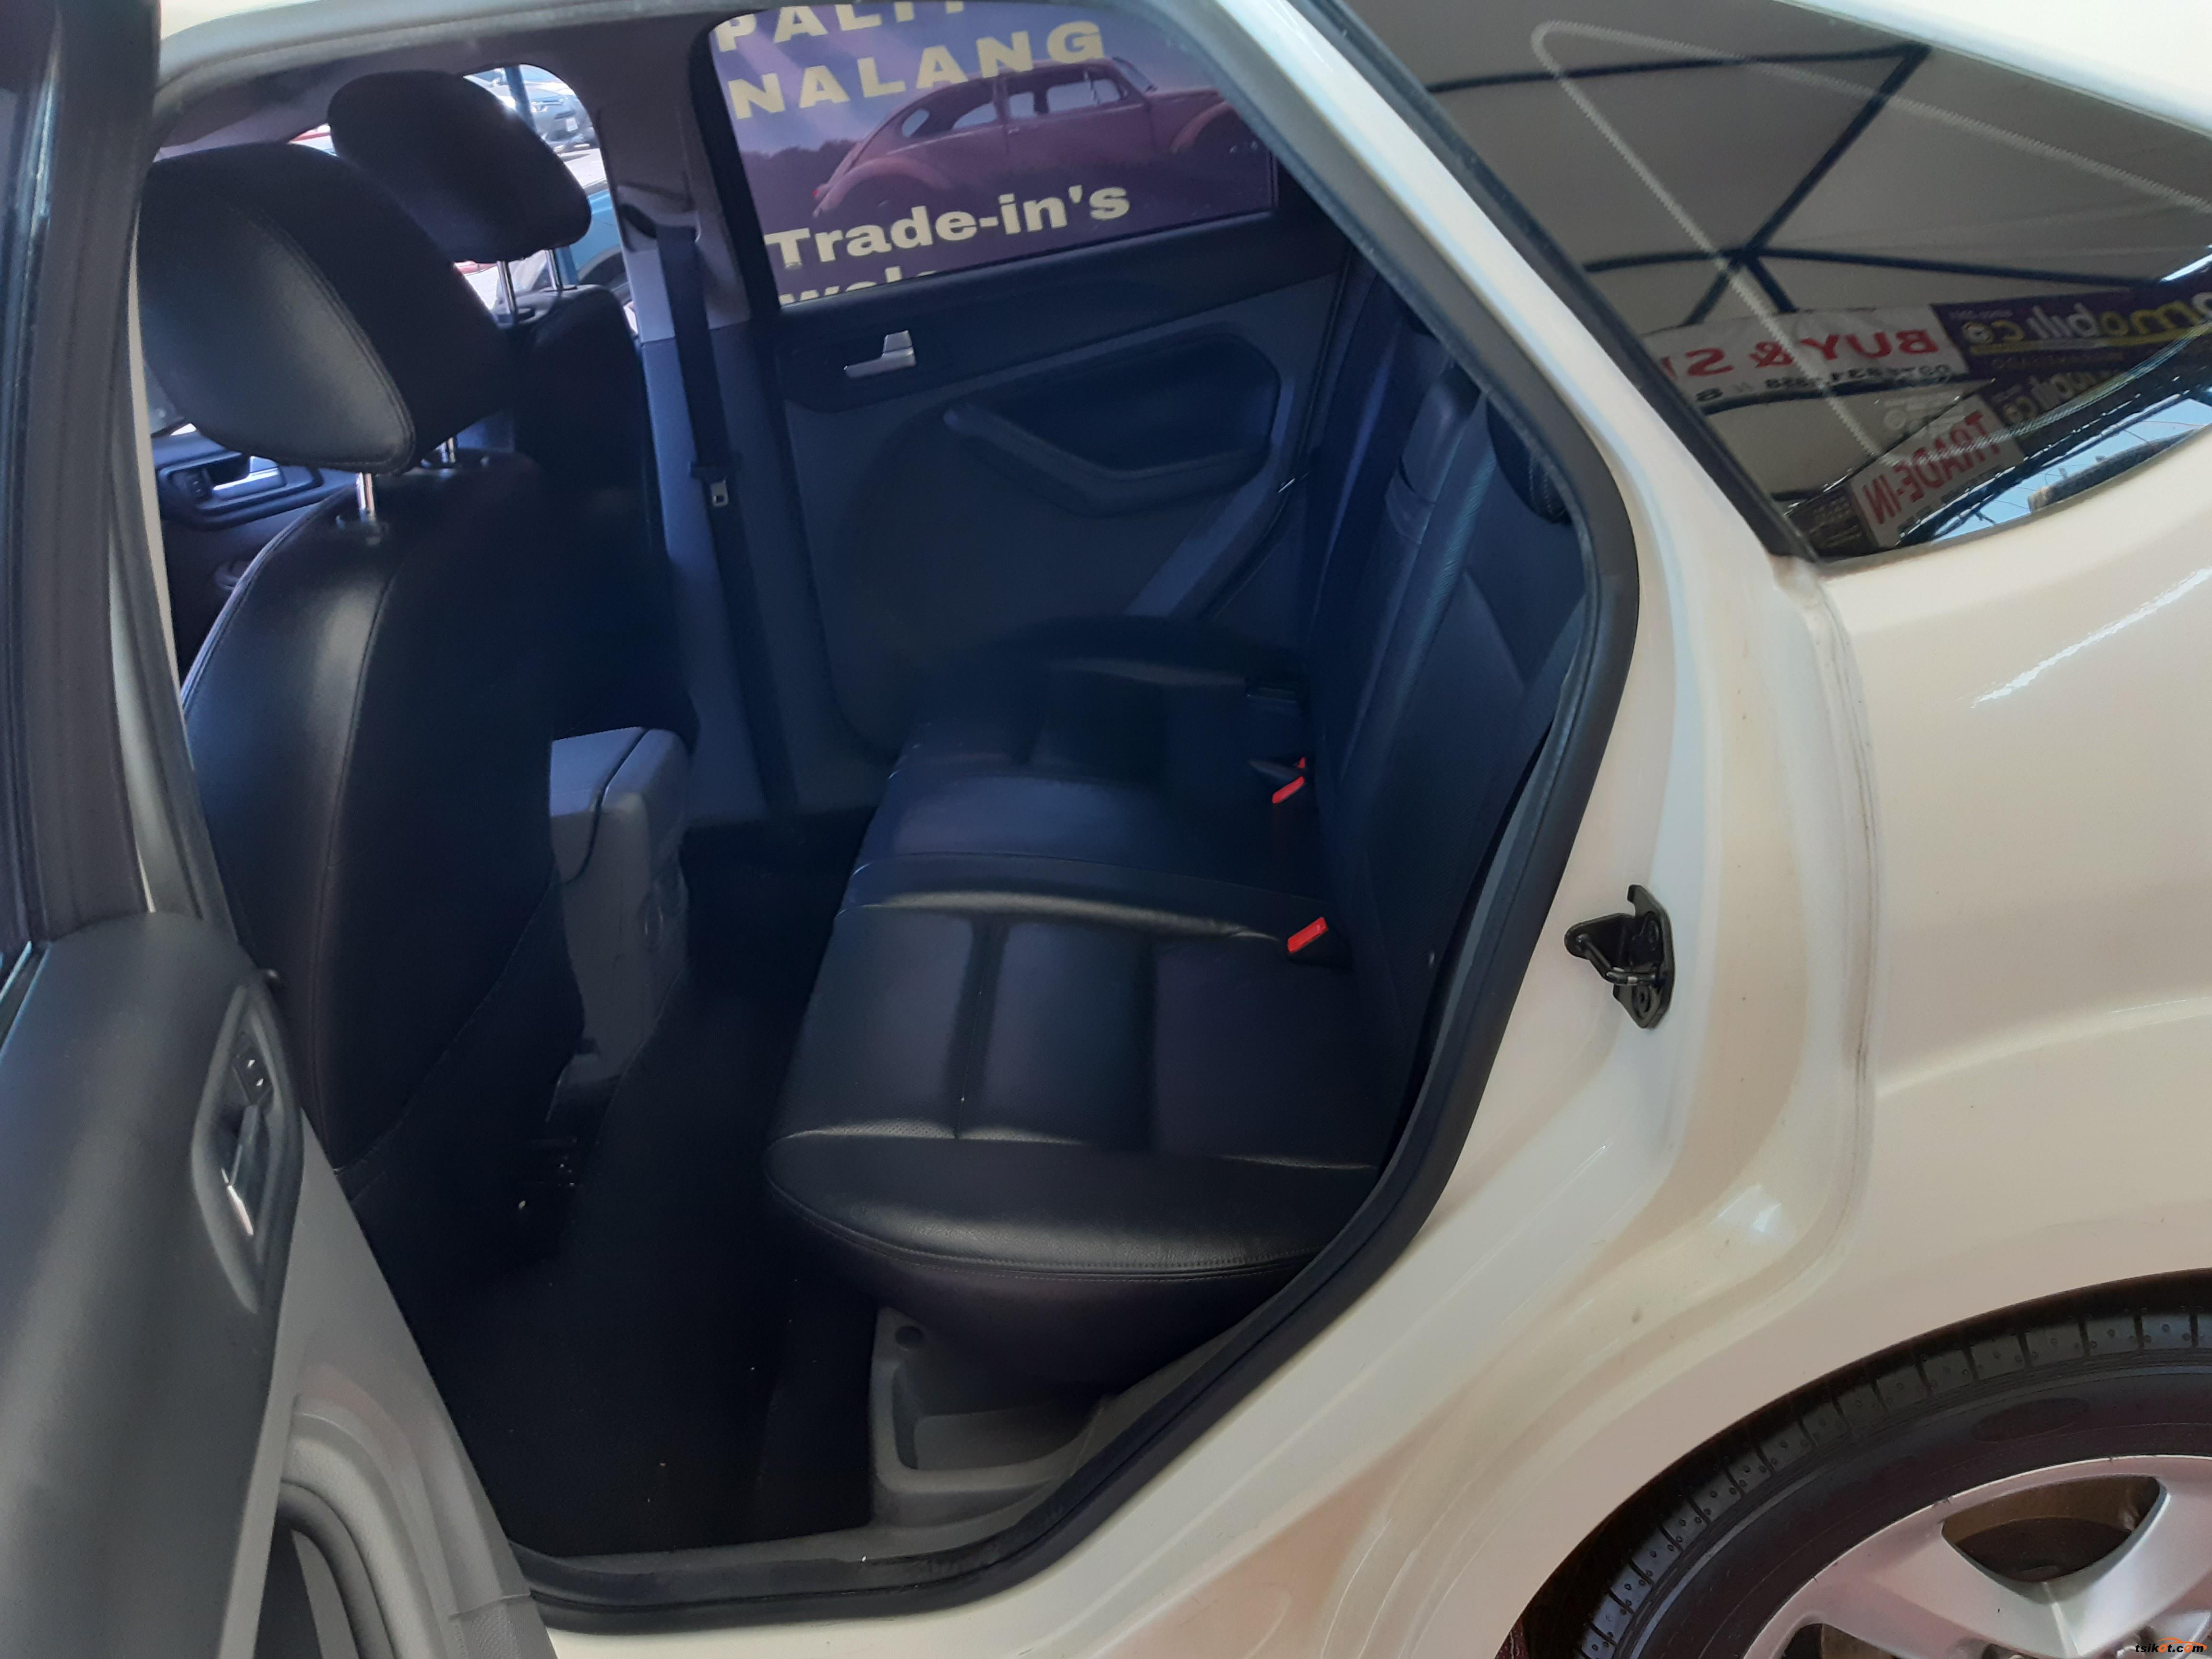 Ford Focus 2010 - 3